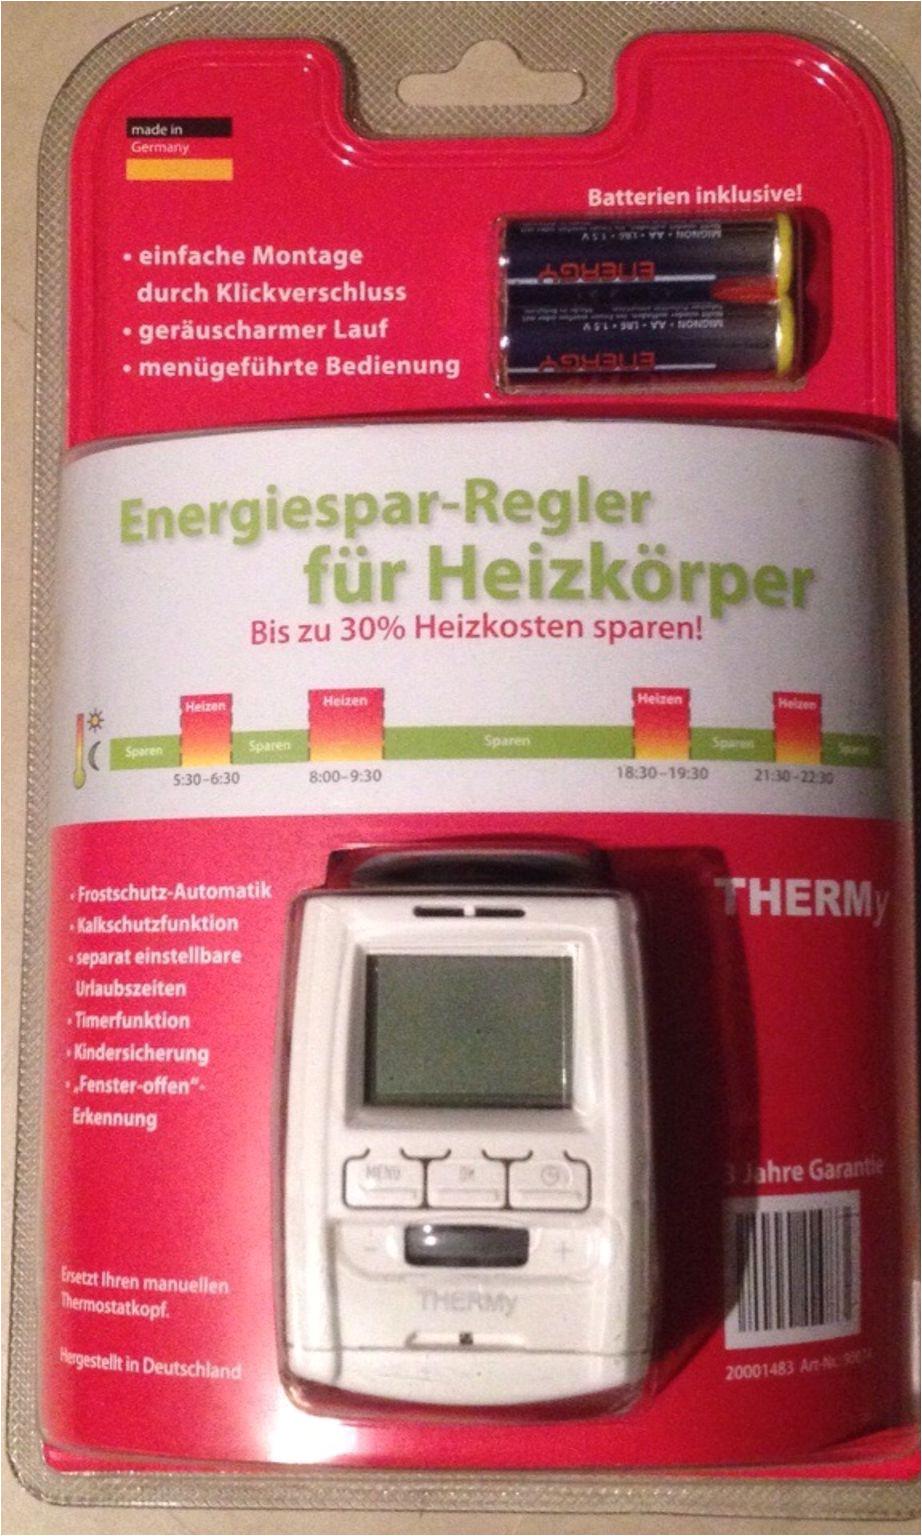 energiespar regler fuer heizkoerper 267046b9 jpg